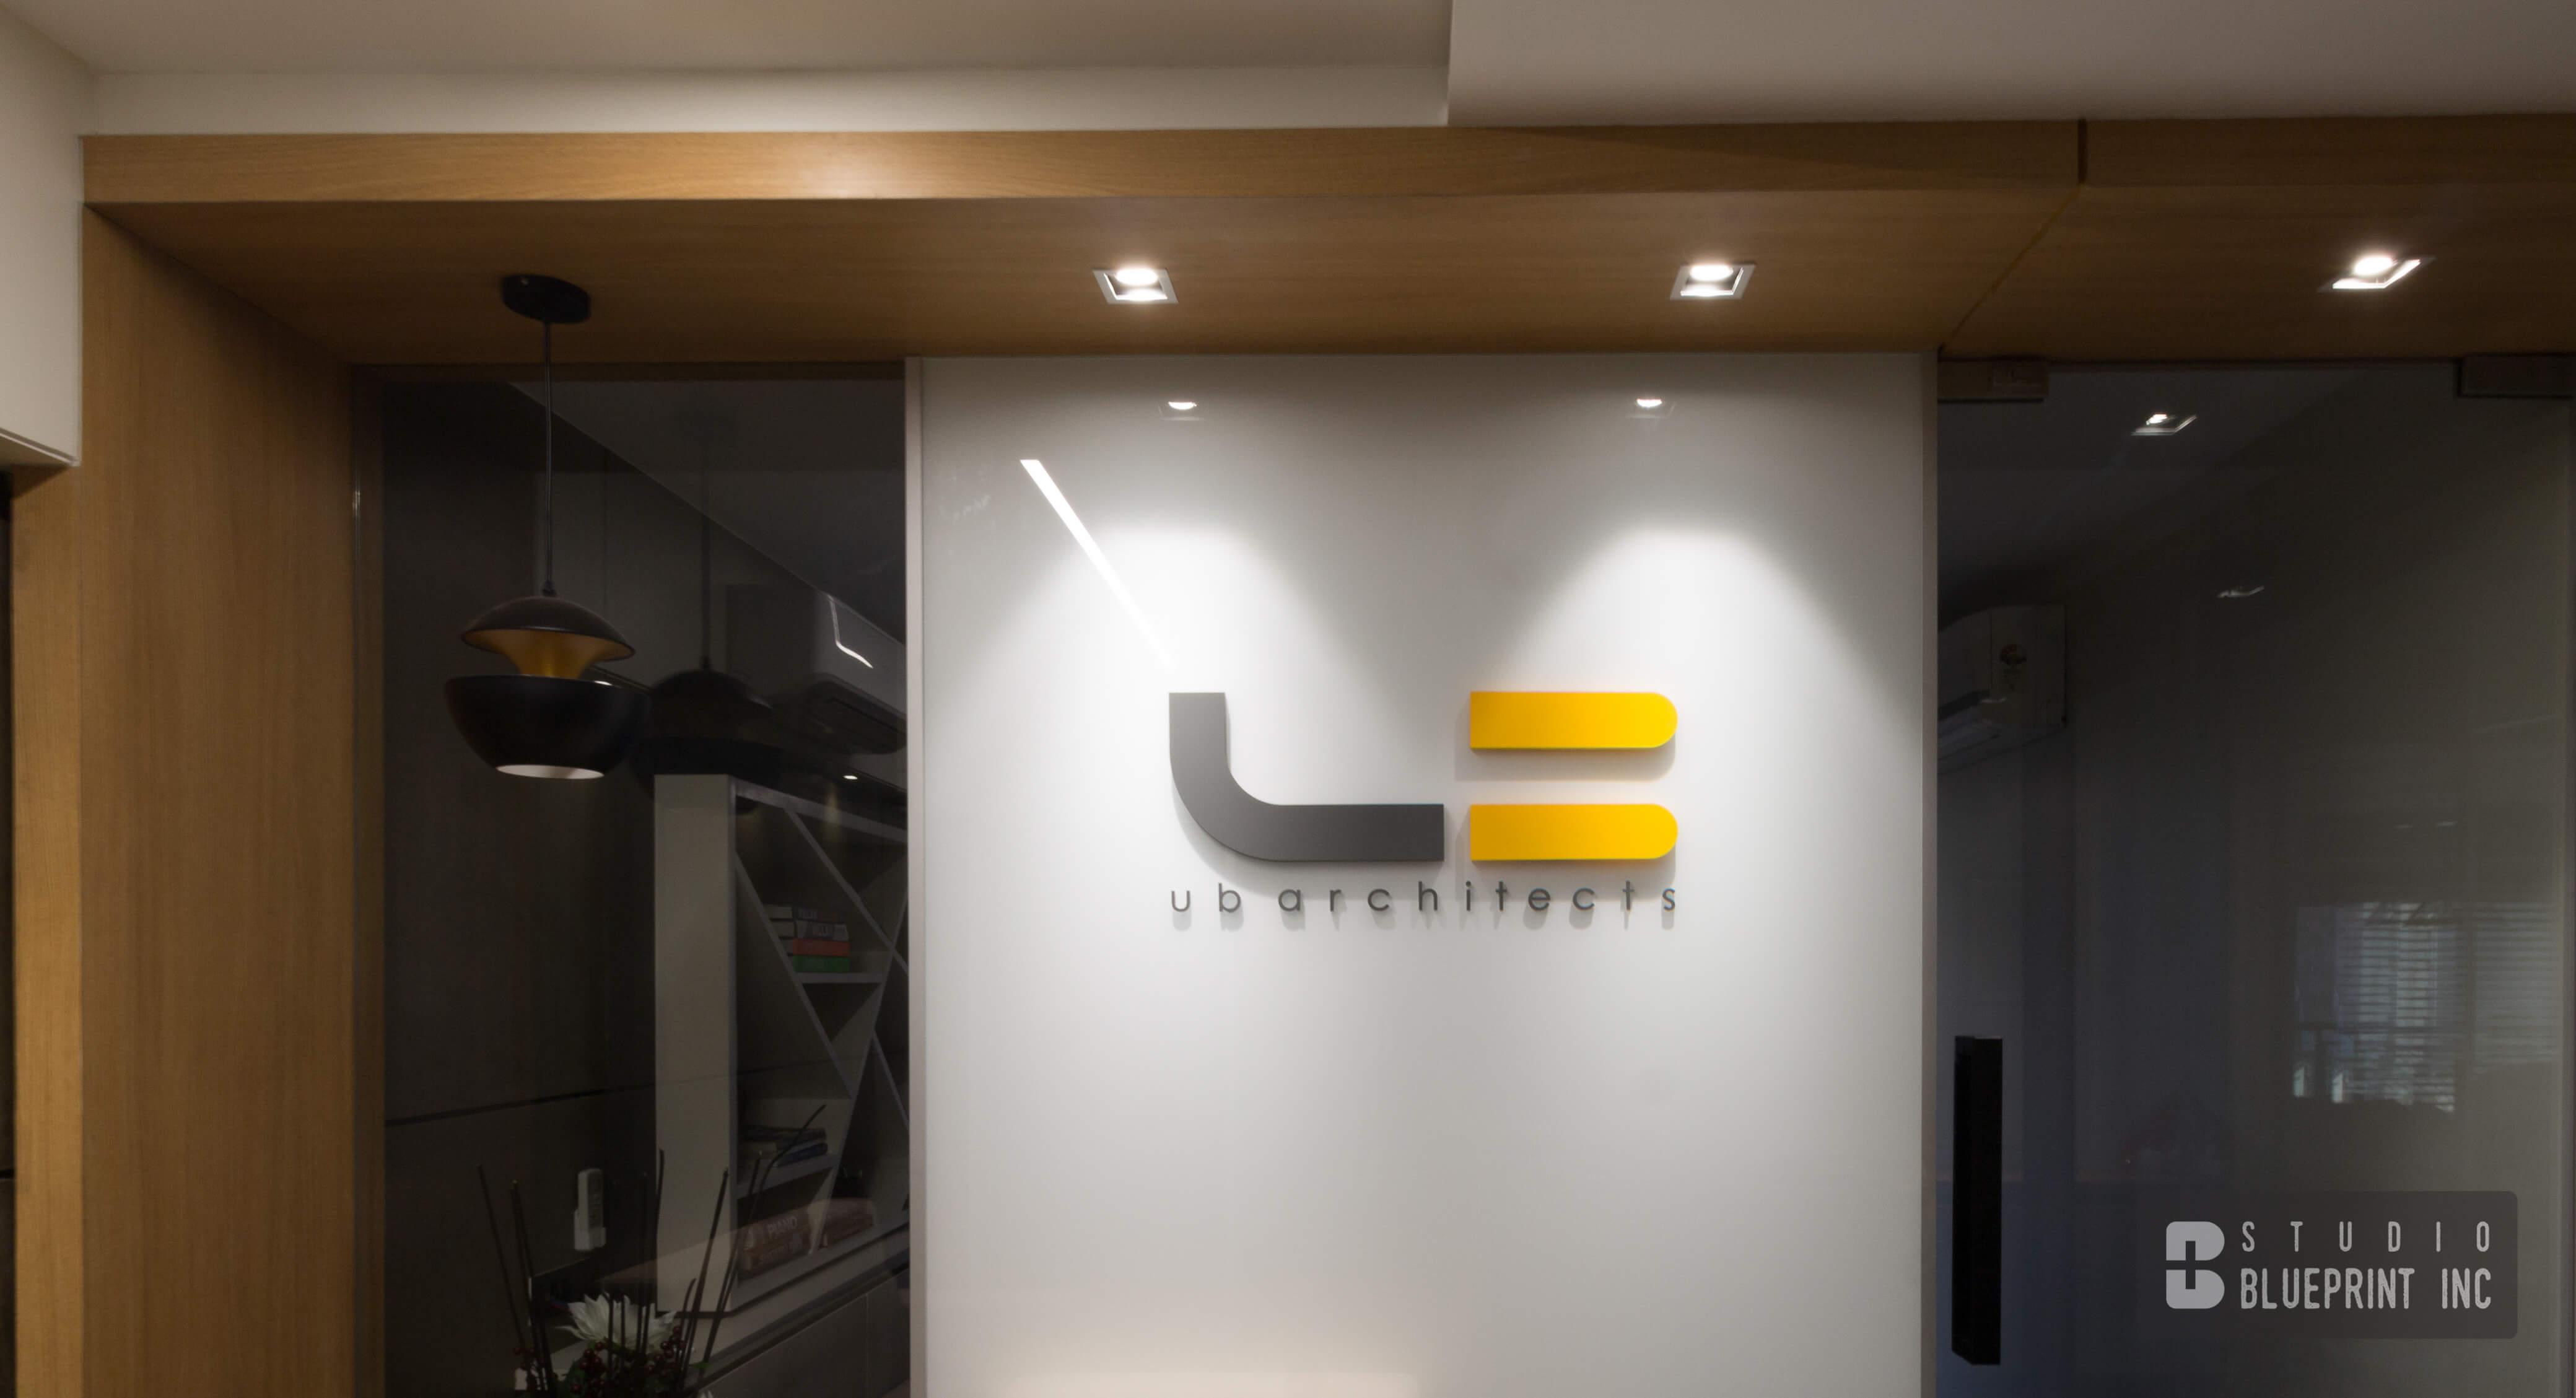 Spot lights to highlight Logo